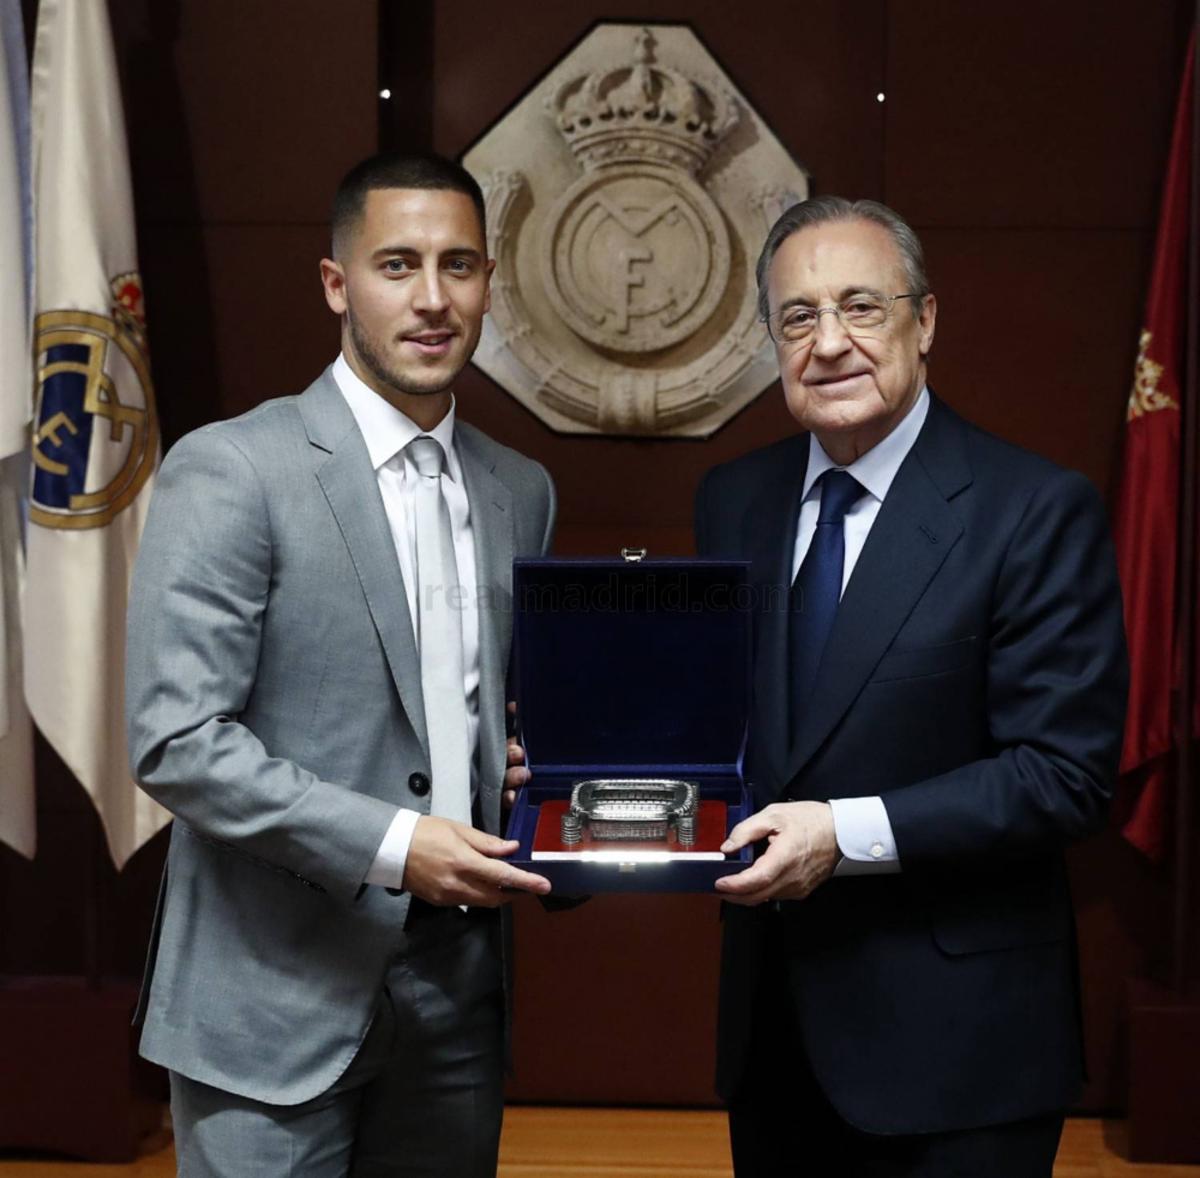 Hazard with Florentino Perez at his presentation.